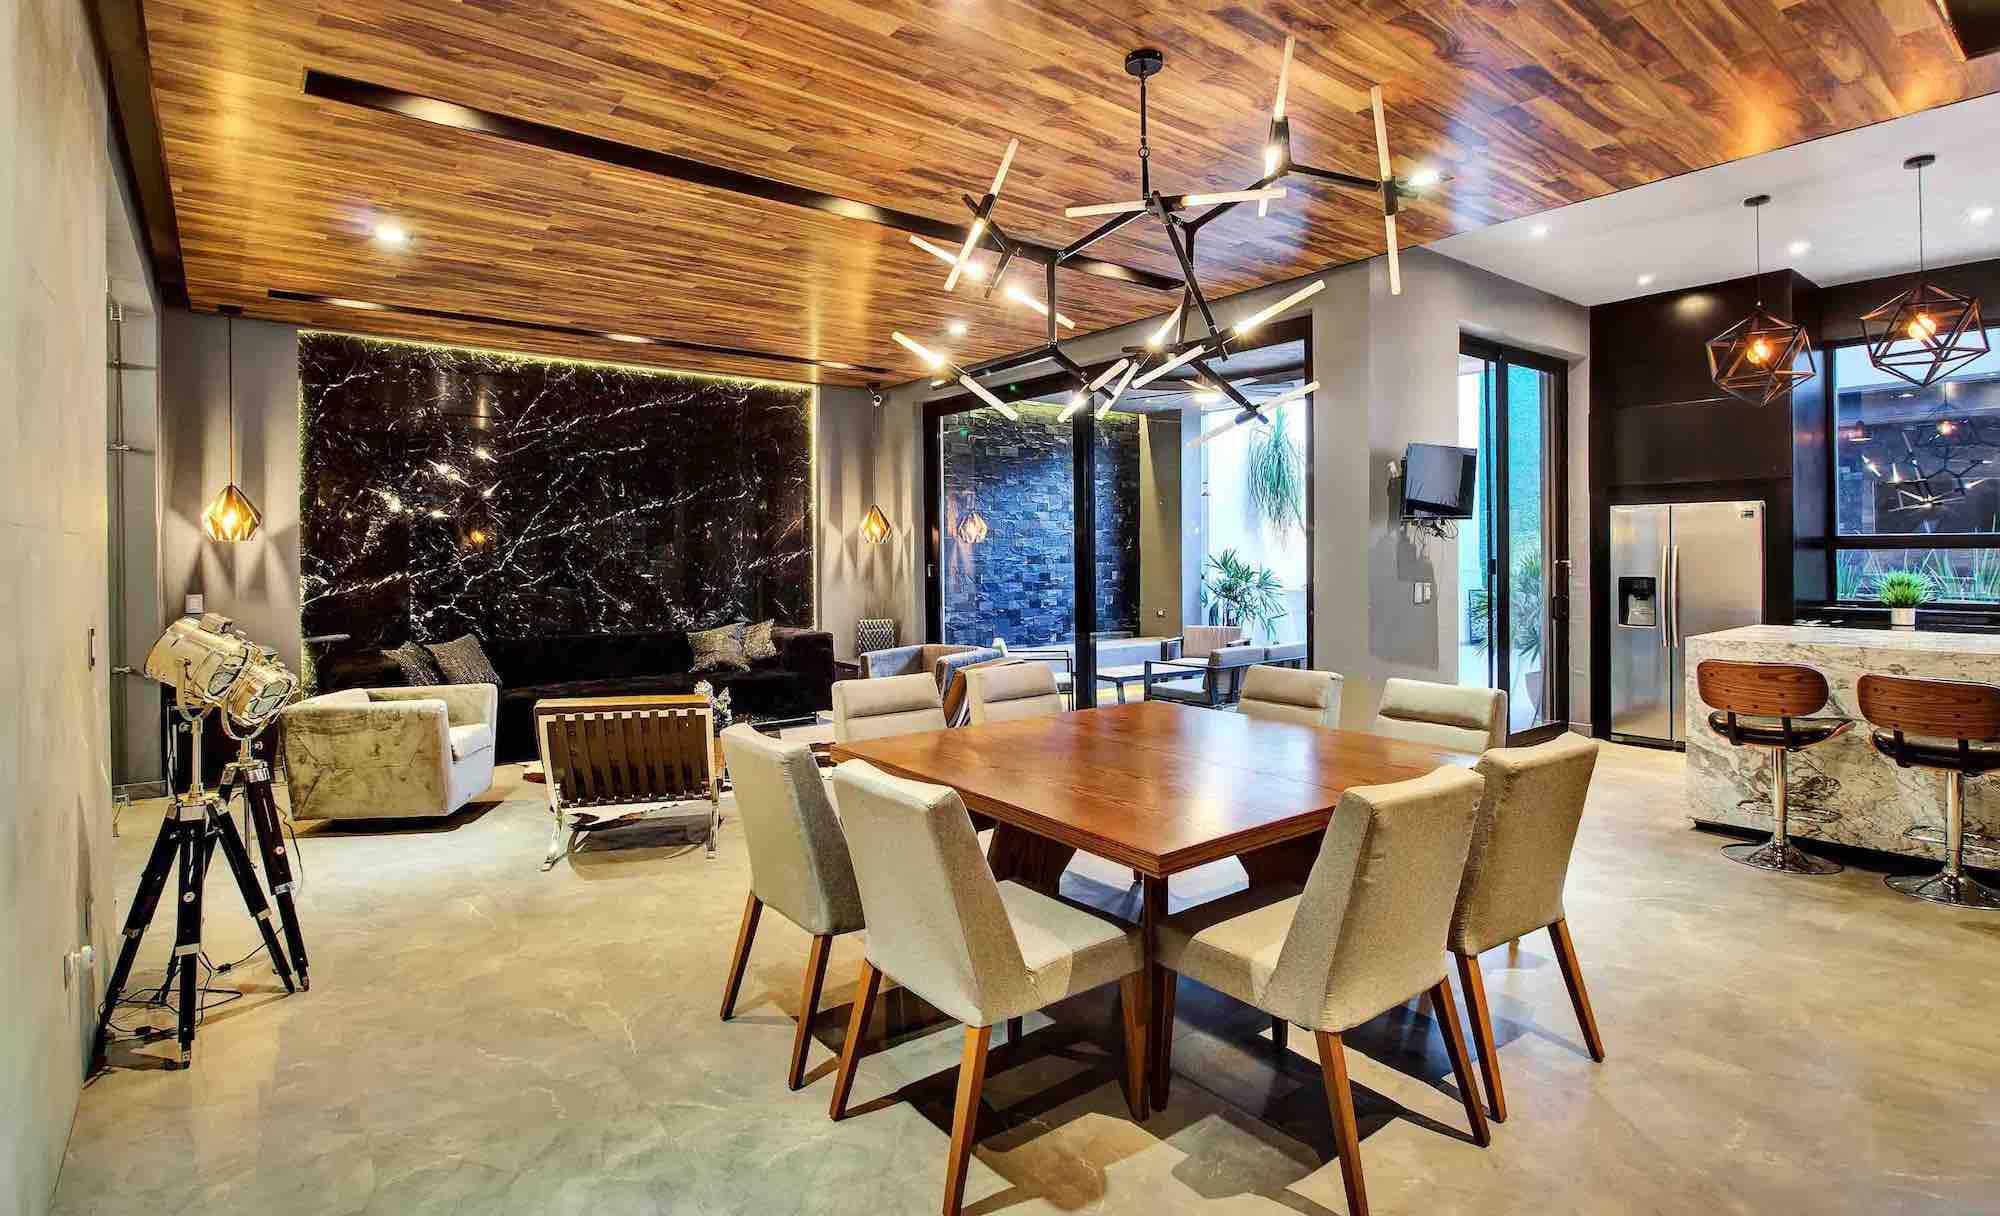 GR_House_Gallardo_arquitectura_amazingarchitecture_mexico_008.jpg